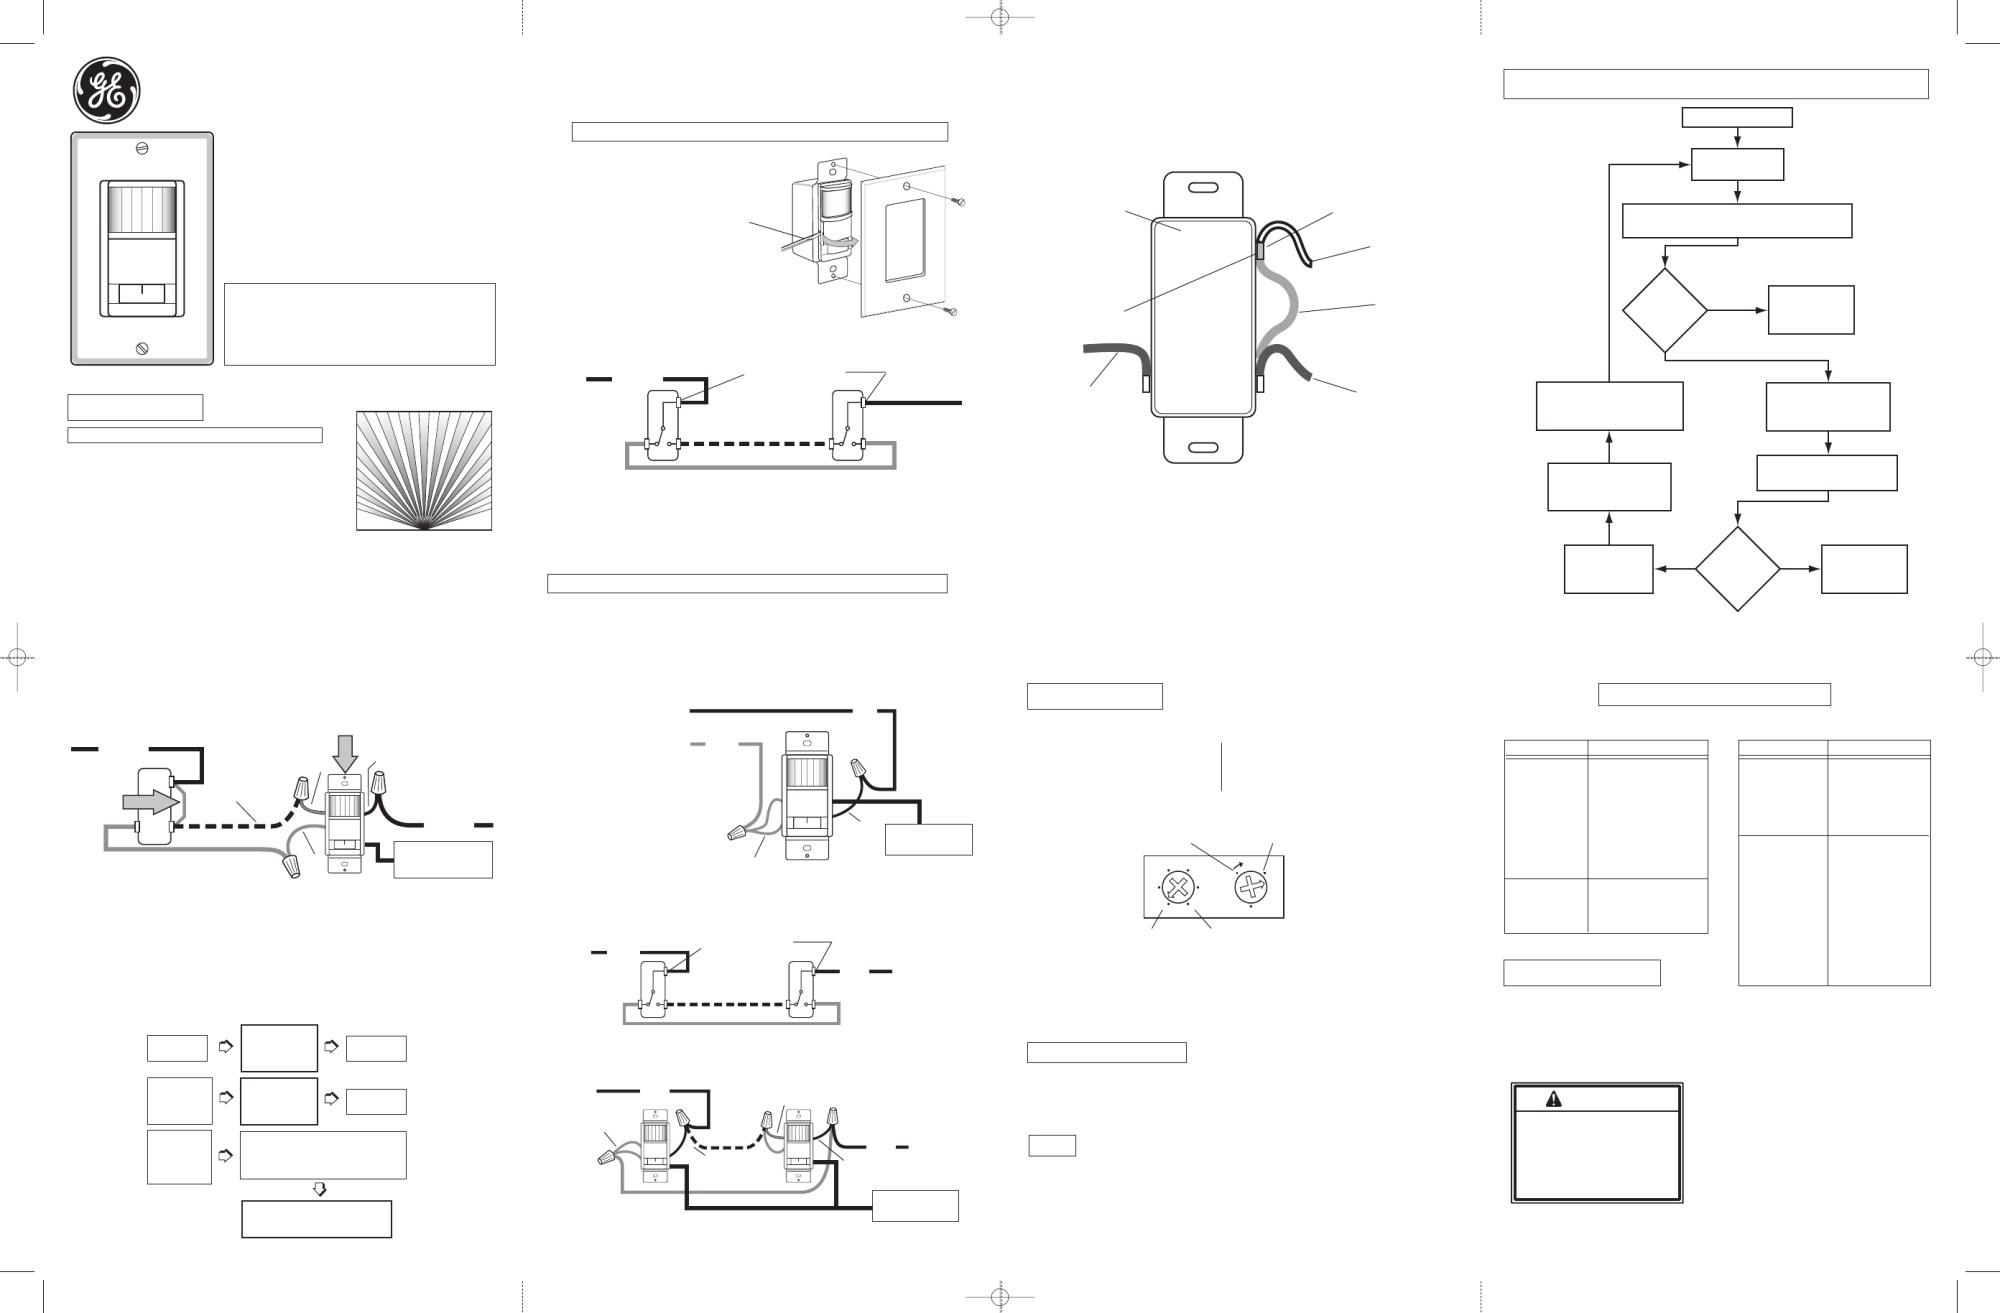 hight resolution of heath zenith motion detector wiring diagram wiring diagram heath zenith motion sensor light wiring diagram